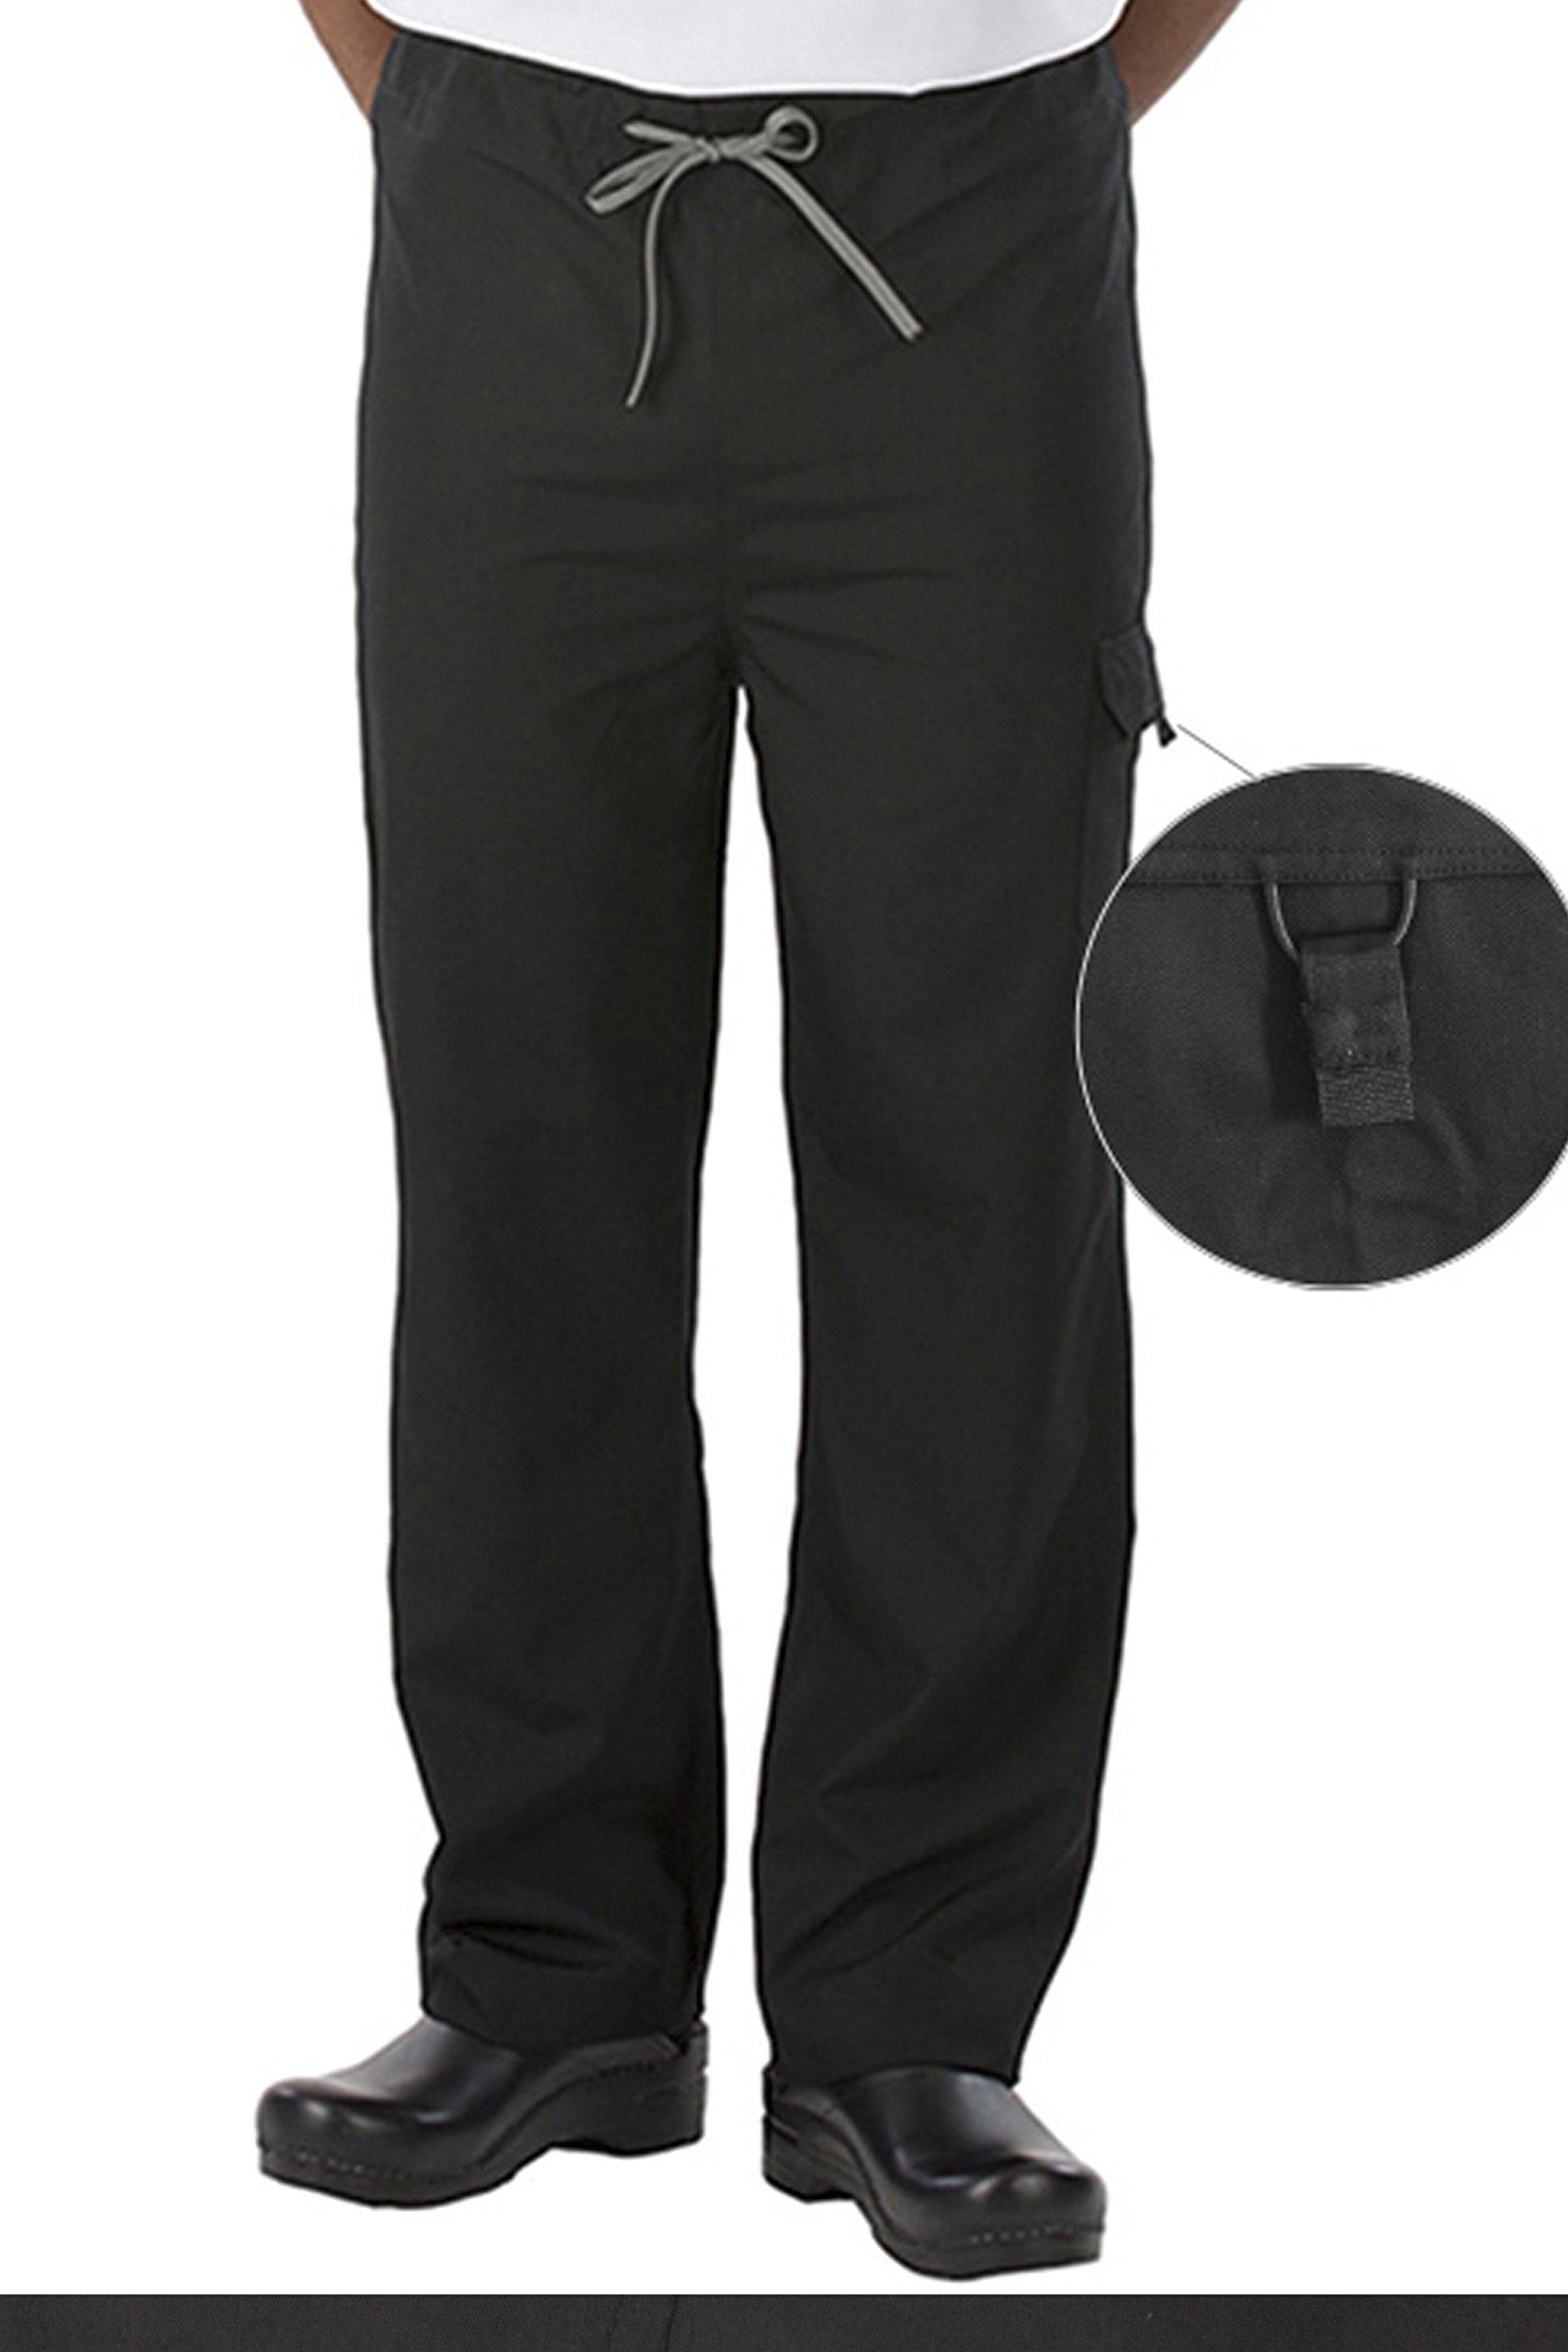 CookCool Basic #Smart Chef Pants (Black, Large)